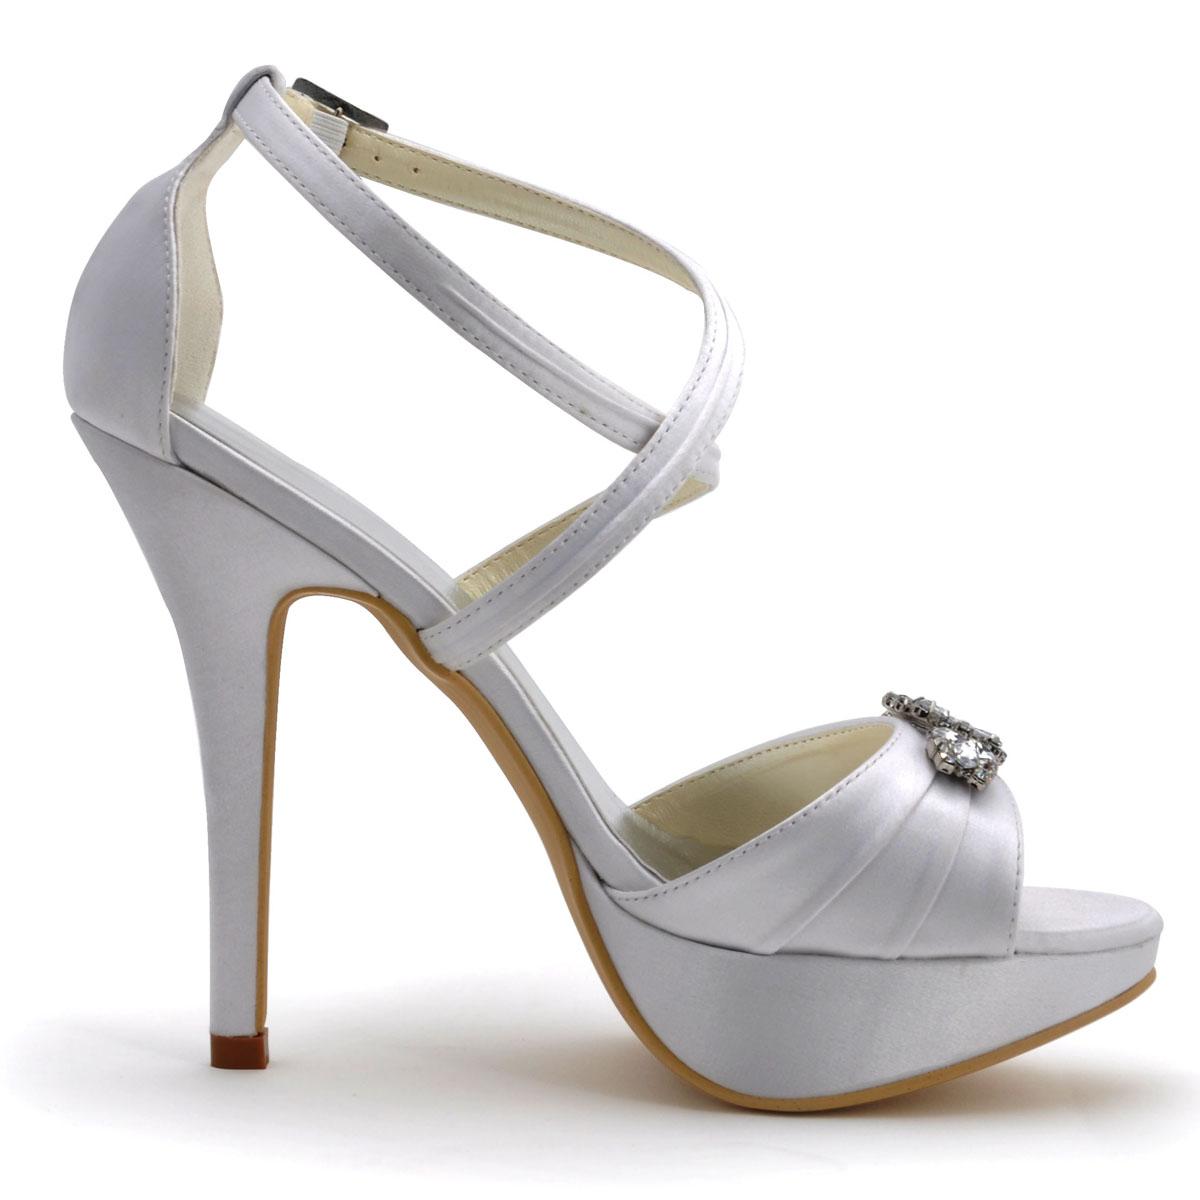 chaussures mariee haut de gamme. Black Bedroom Furniture Sets. Home Design Ideas